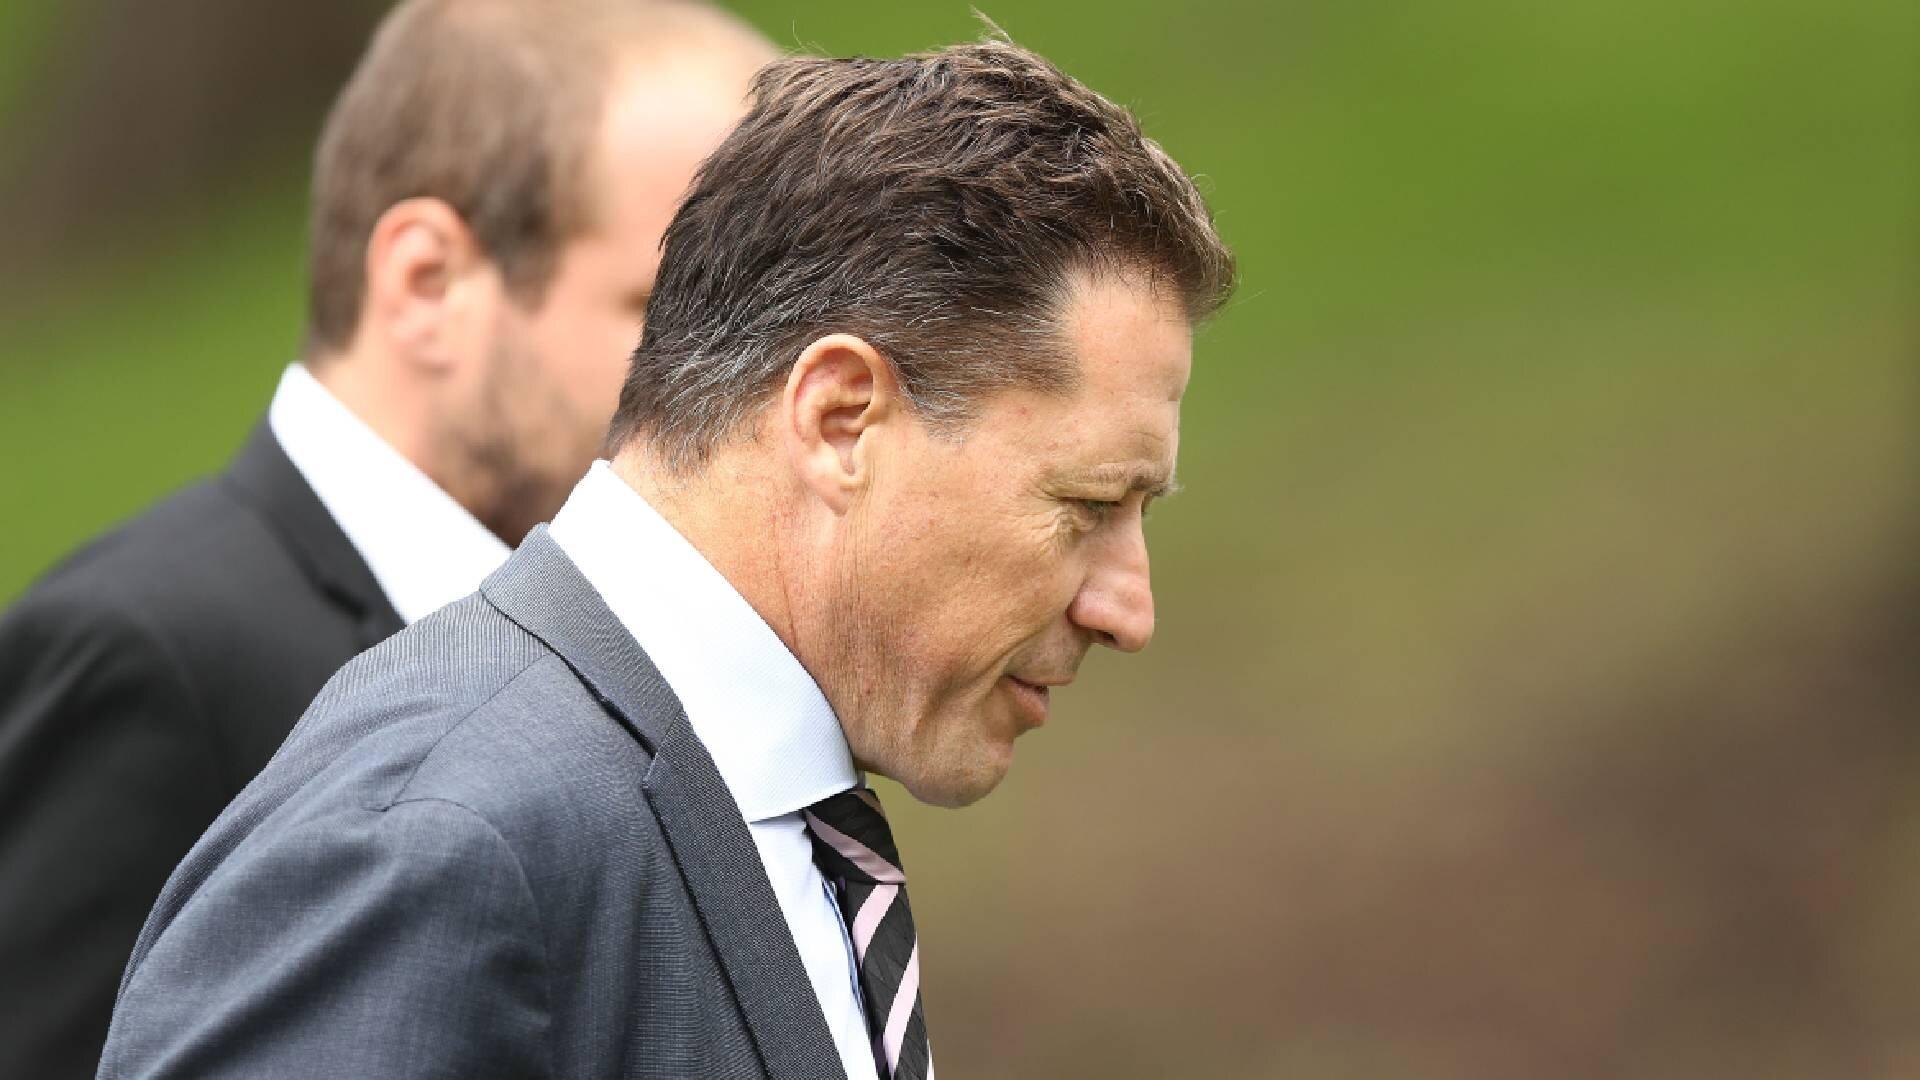 'Paper talk': Phil Kearns dismisses report of replacing Rugby Australia boss Raelene Castle